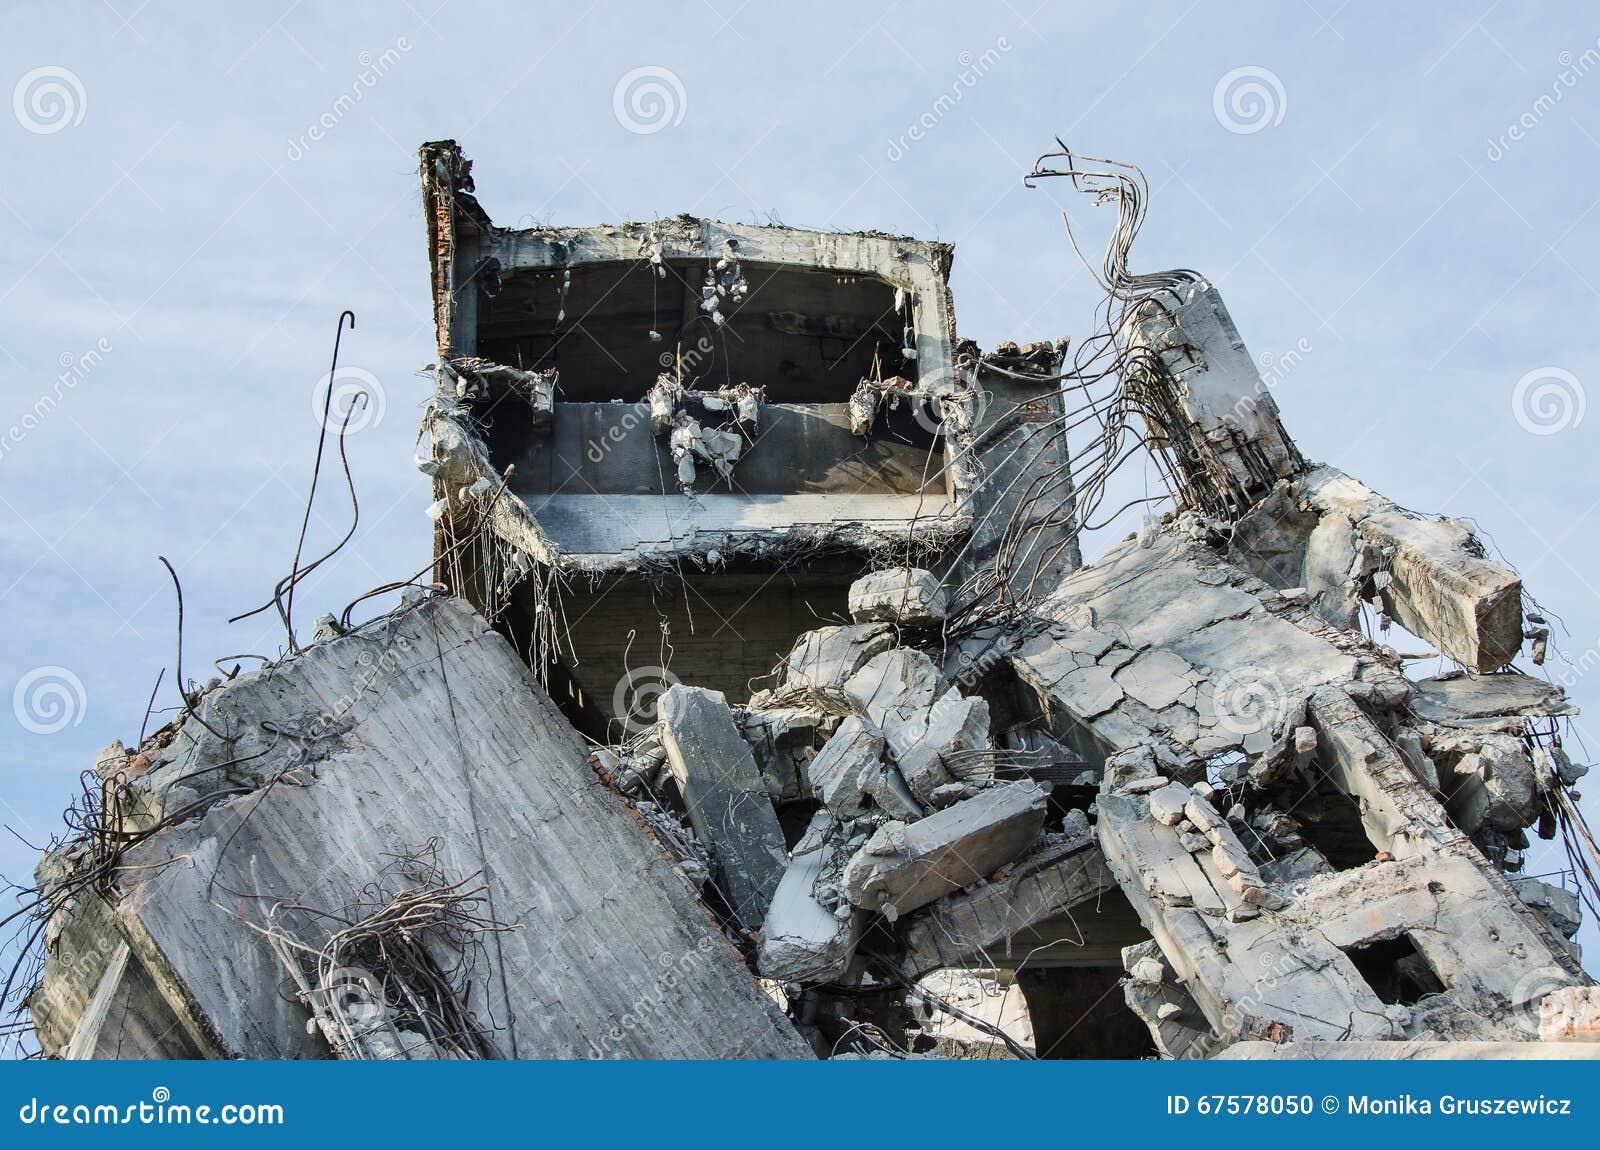 Building Demolition Cartoon : Rubble and scrap after demolition stock photography